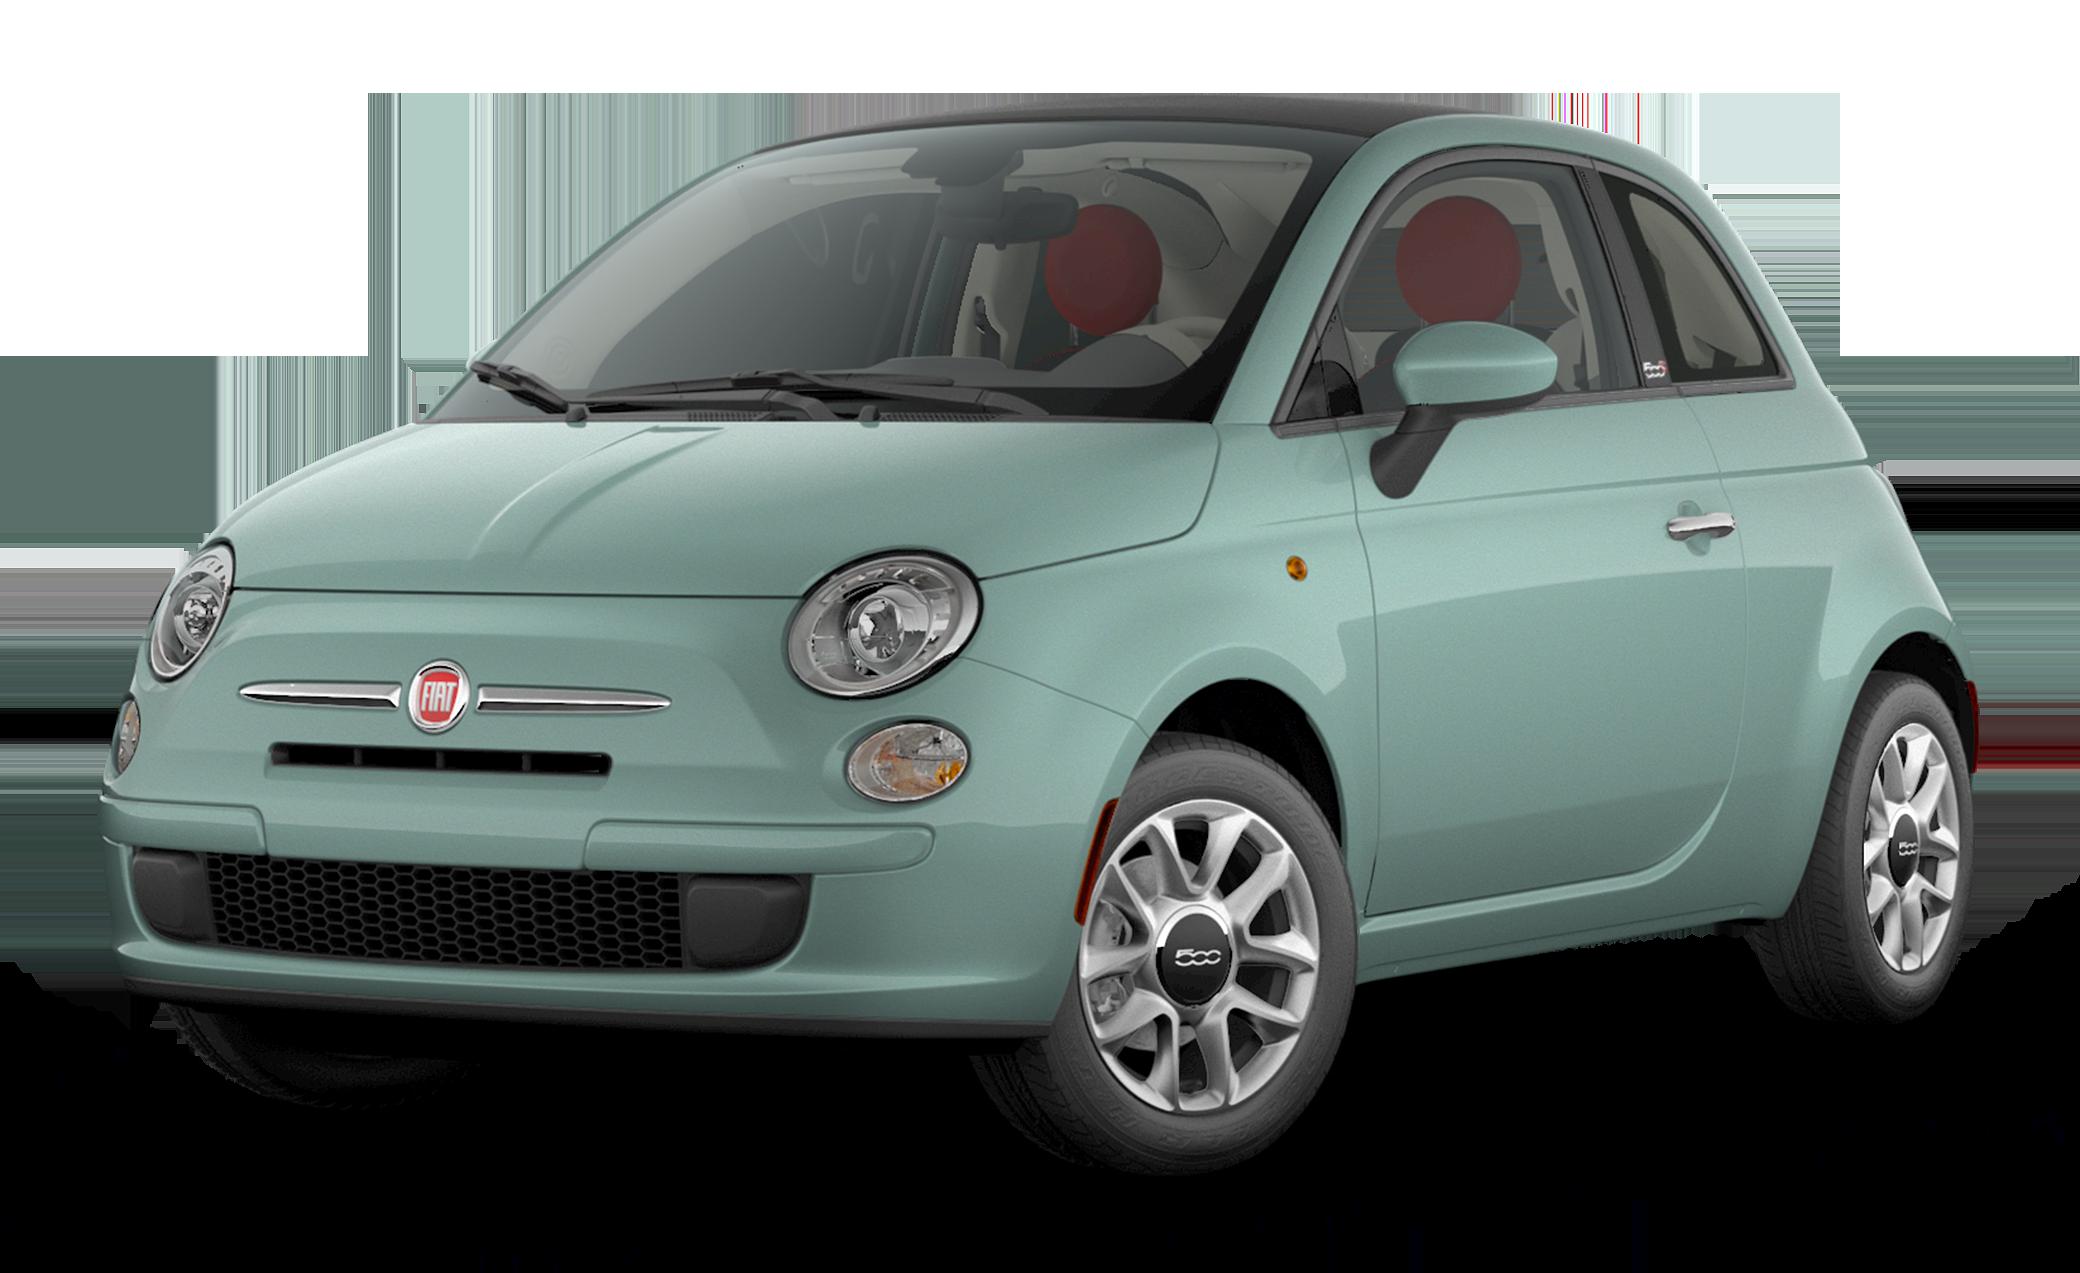 Suburban Chevrolet Ann Arbor >> Suburban Ann Arbor | New Car Release Information